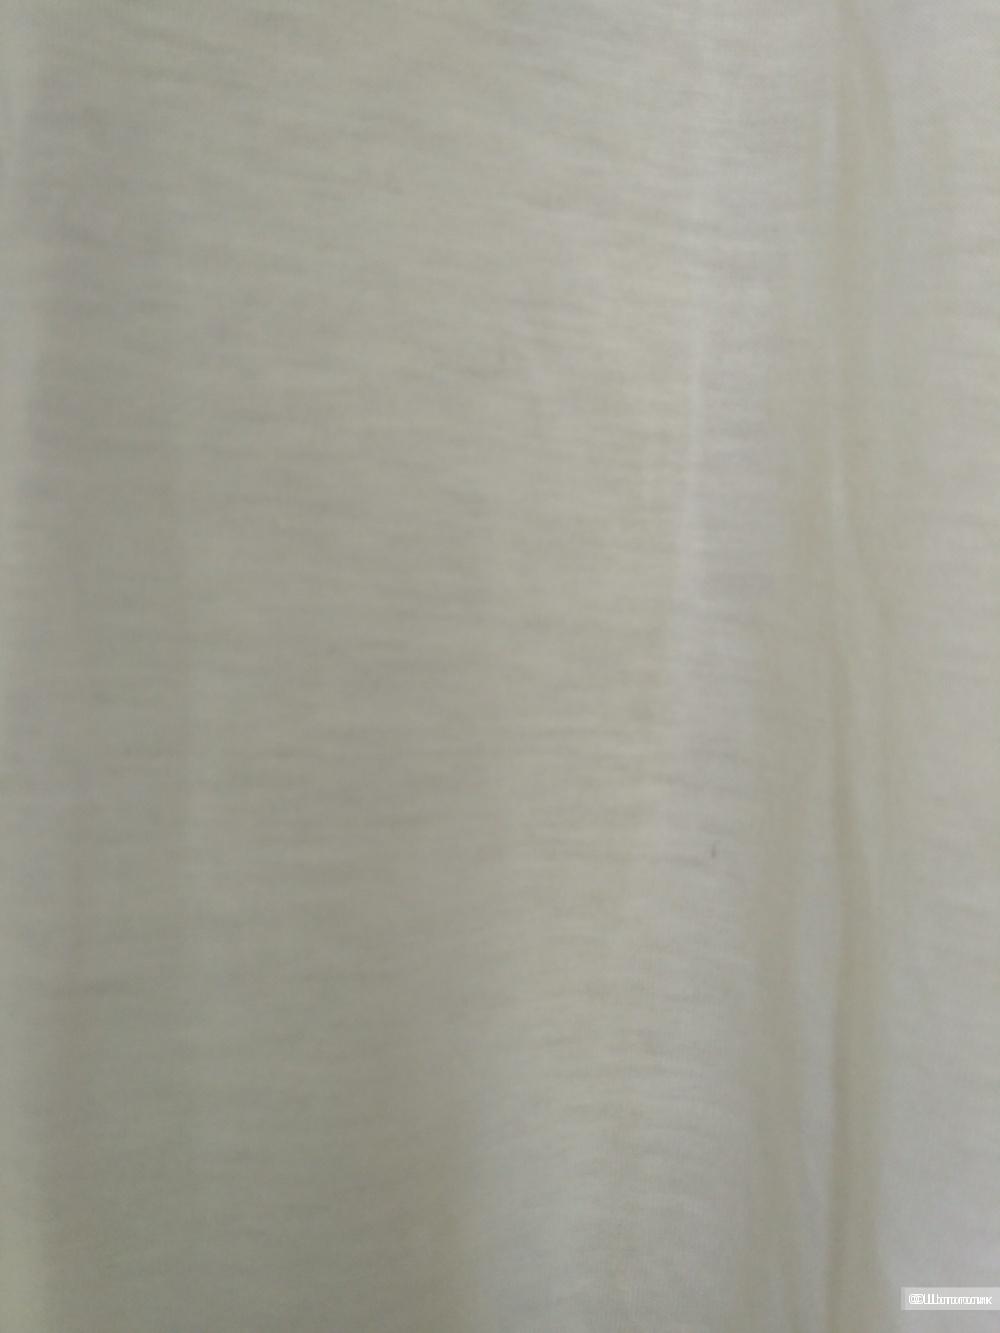 Футболка  Massimo Dutti,  размер L